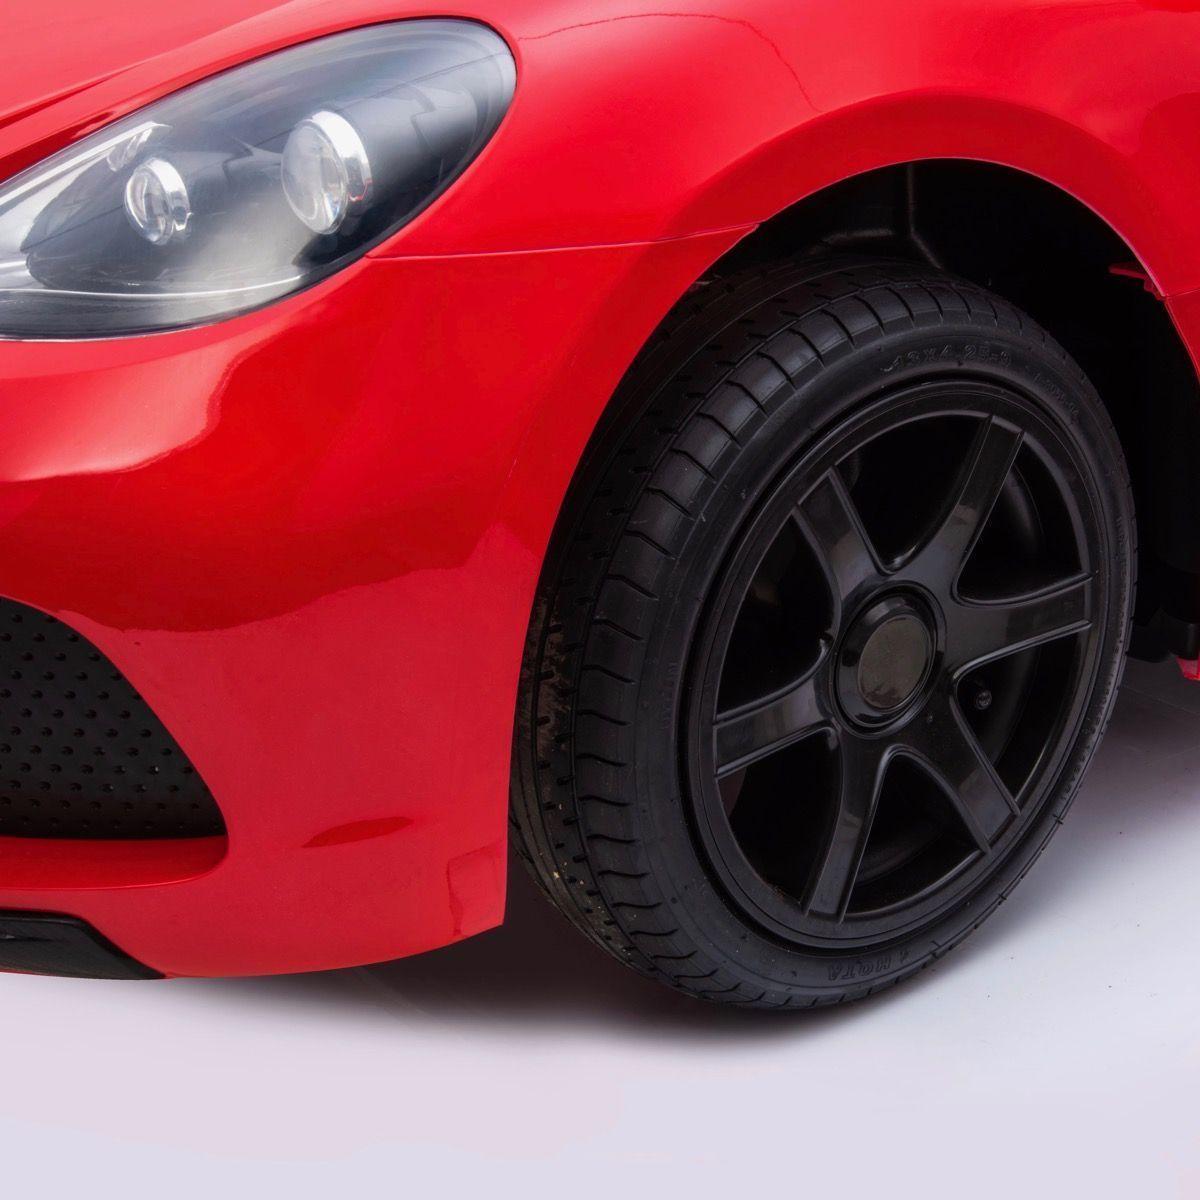 Deportivo Pekecars XL 24V Rojo - rueda